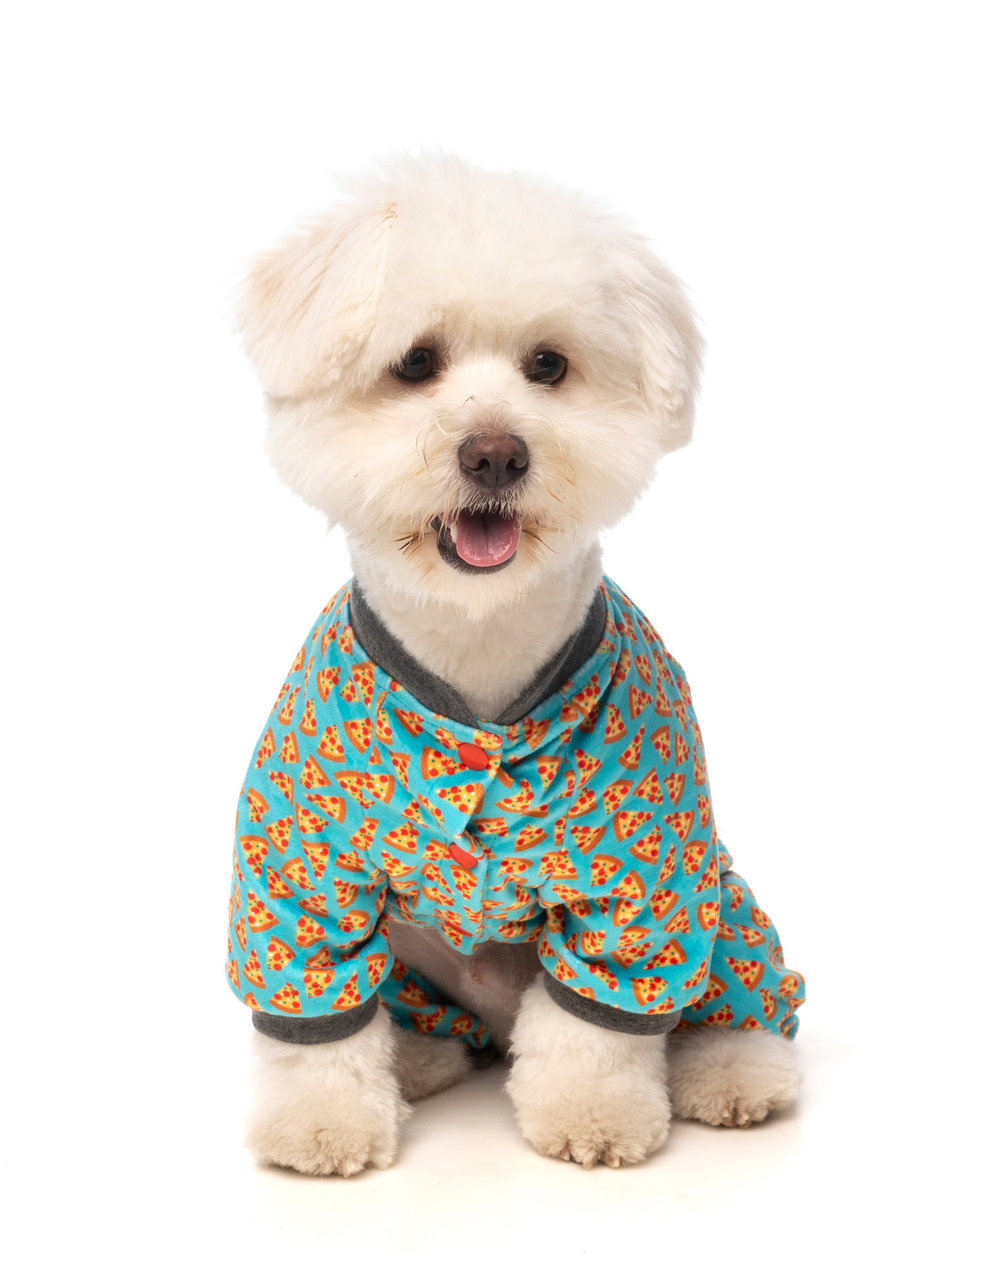 fzapiz1-7_pyjamas_pizzalyf_dog_35.jpg